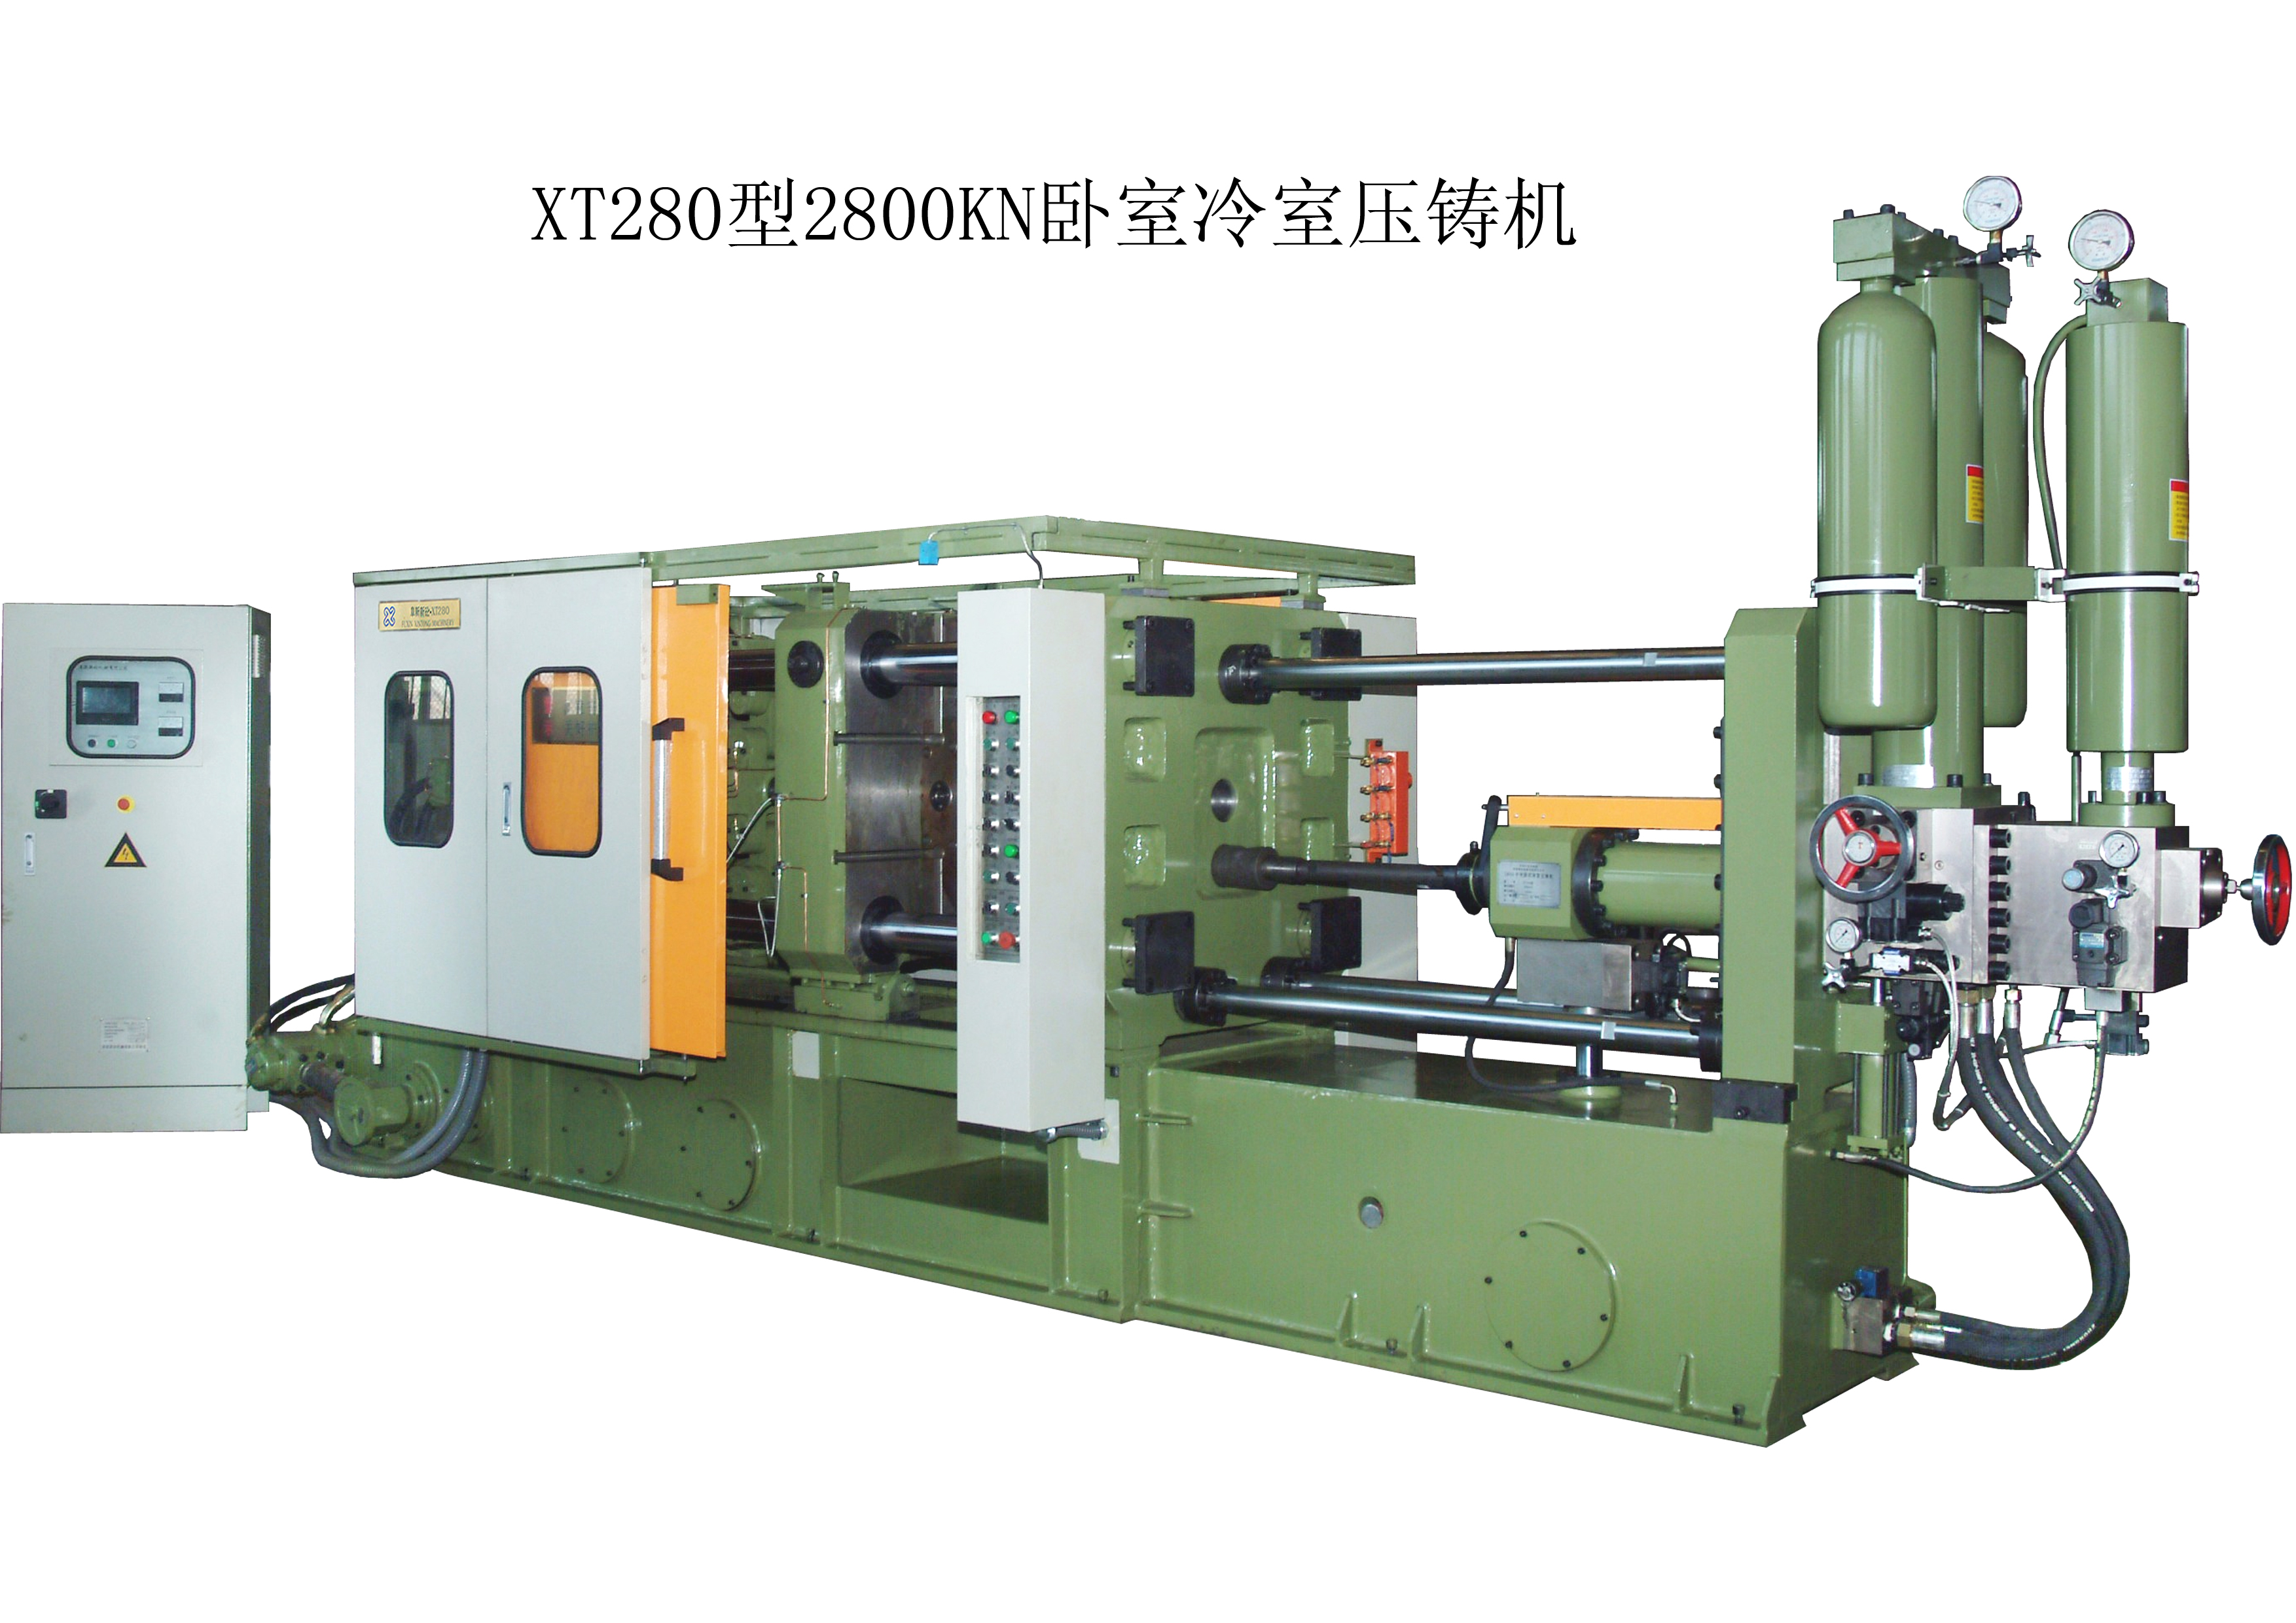 XT280型2800KN臥室冷室壓鑄機